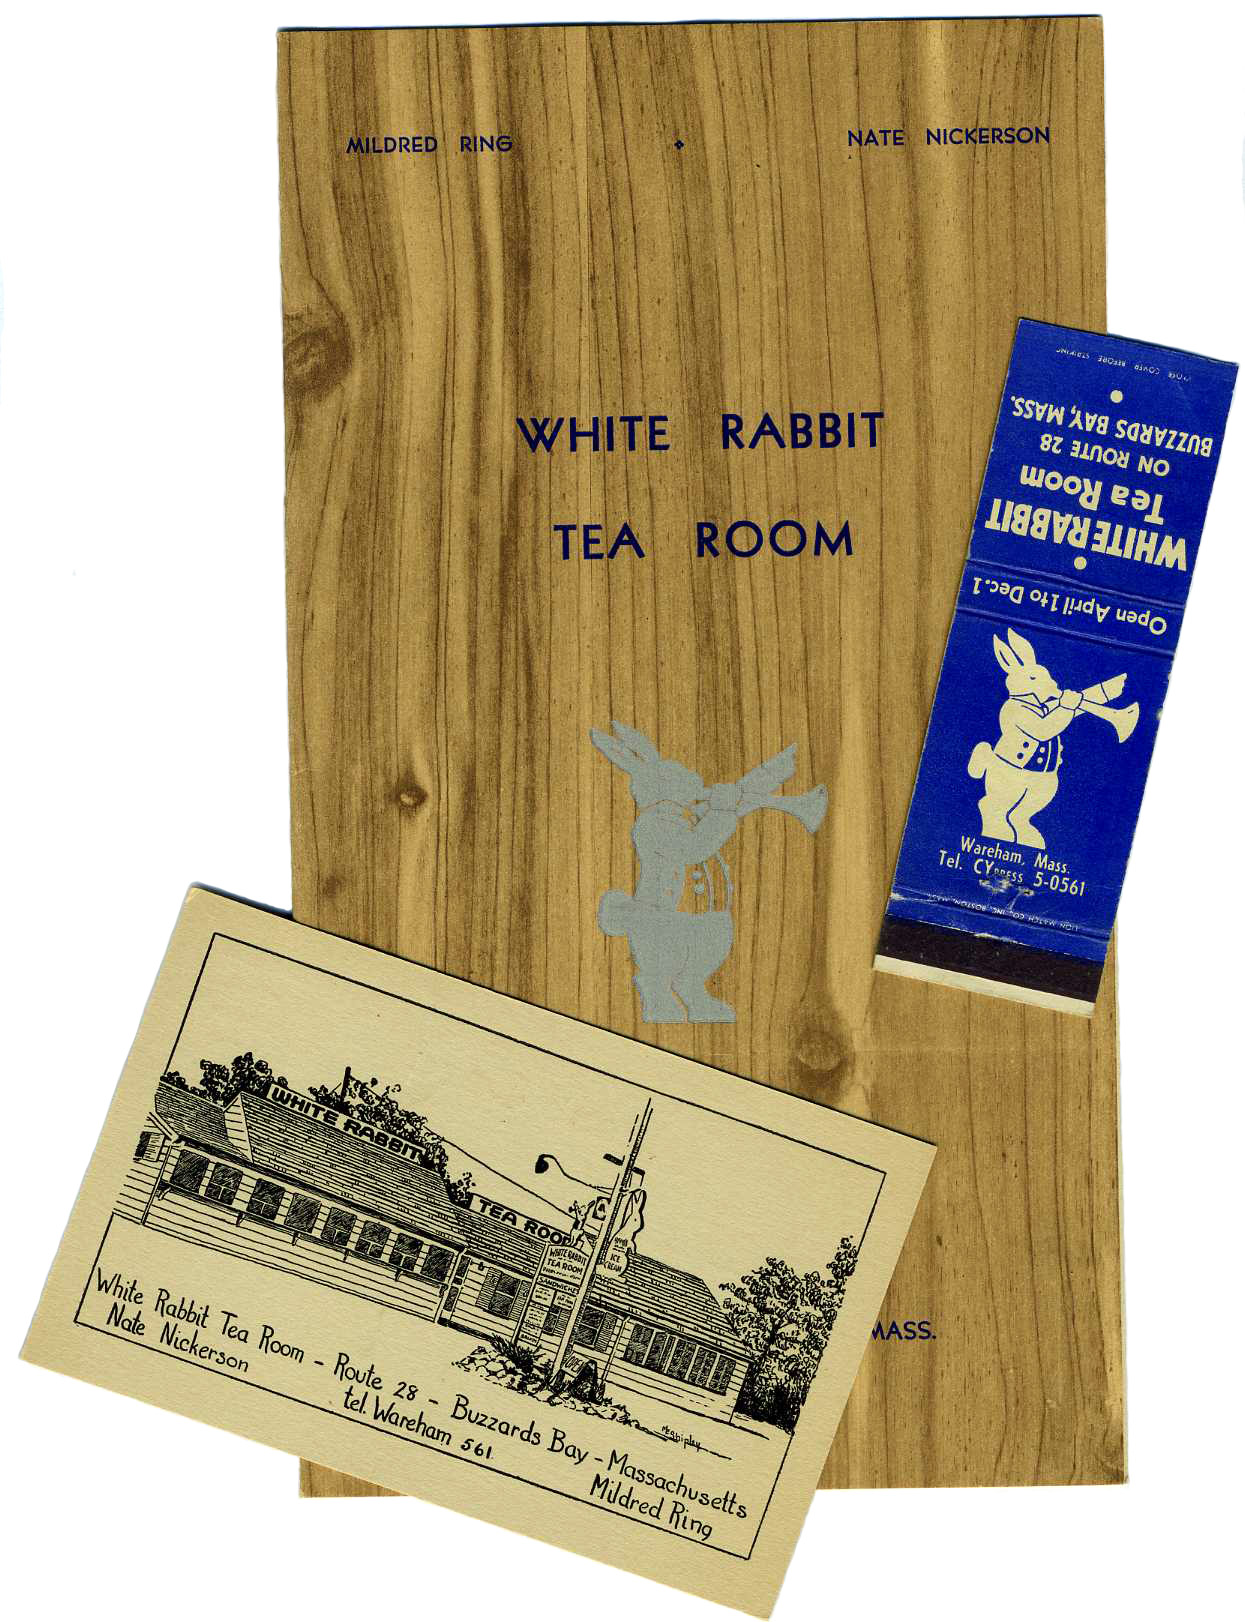 1940s   Restaurant-ing through history